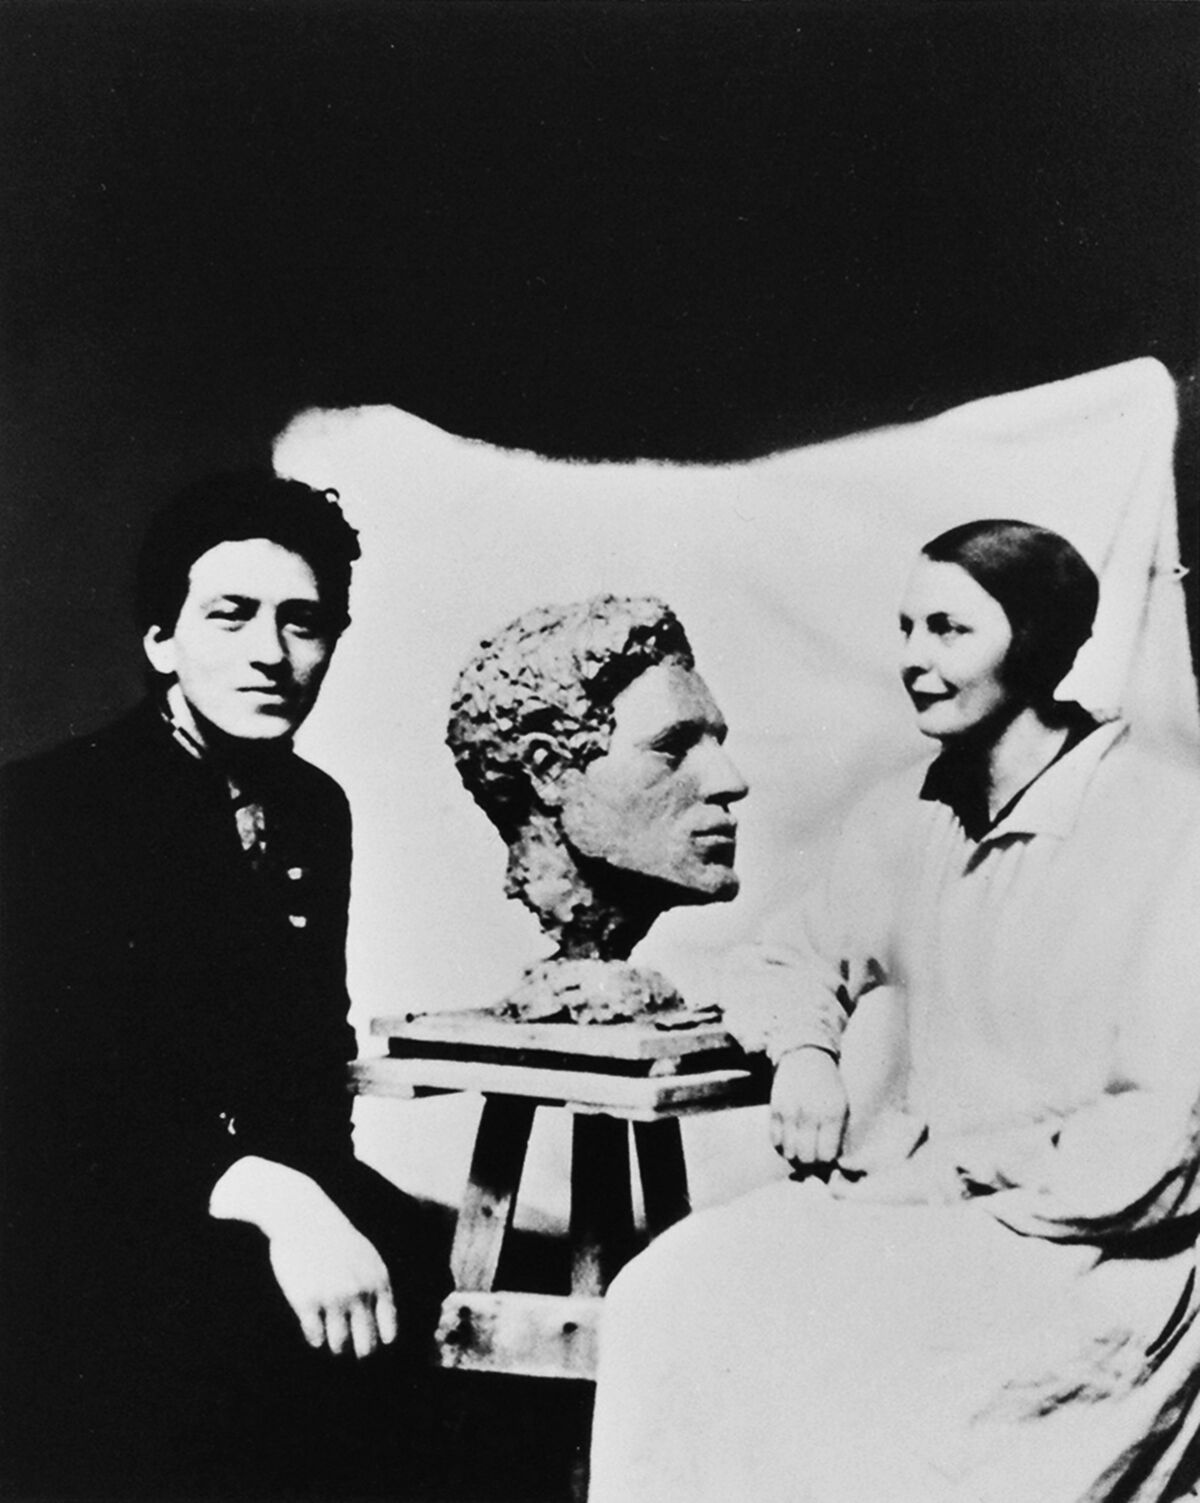 Teresa Hubbard and Alexander Birchler, Bust, 2017. Photo by Ugo Carmeni. Courtesy of the artists, Tanya Bonakdar Gallery, New York and Lora Reynolds Gallery, Austin.